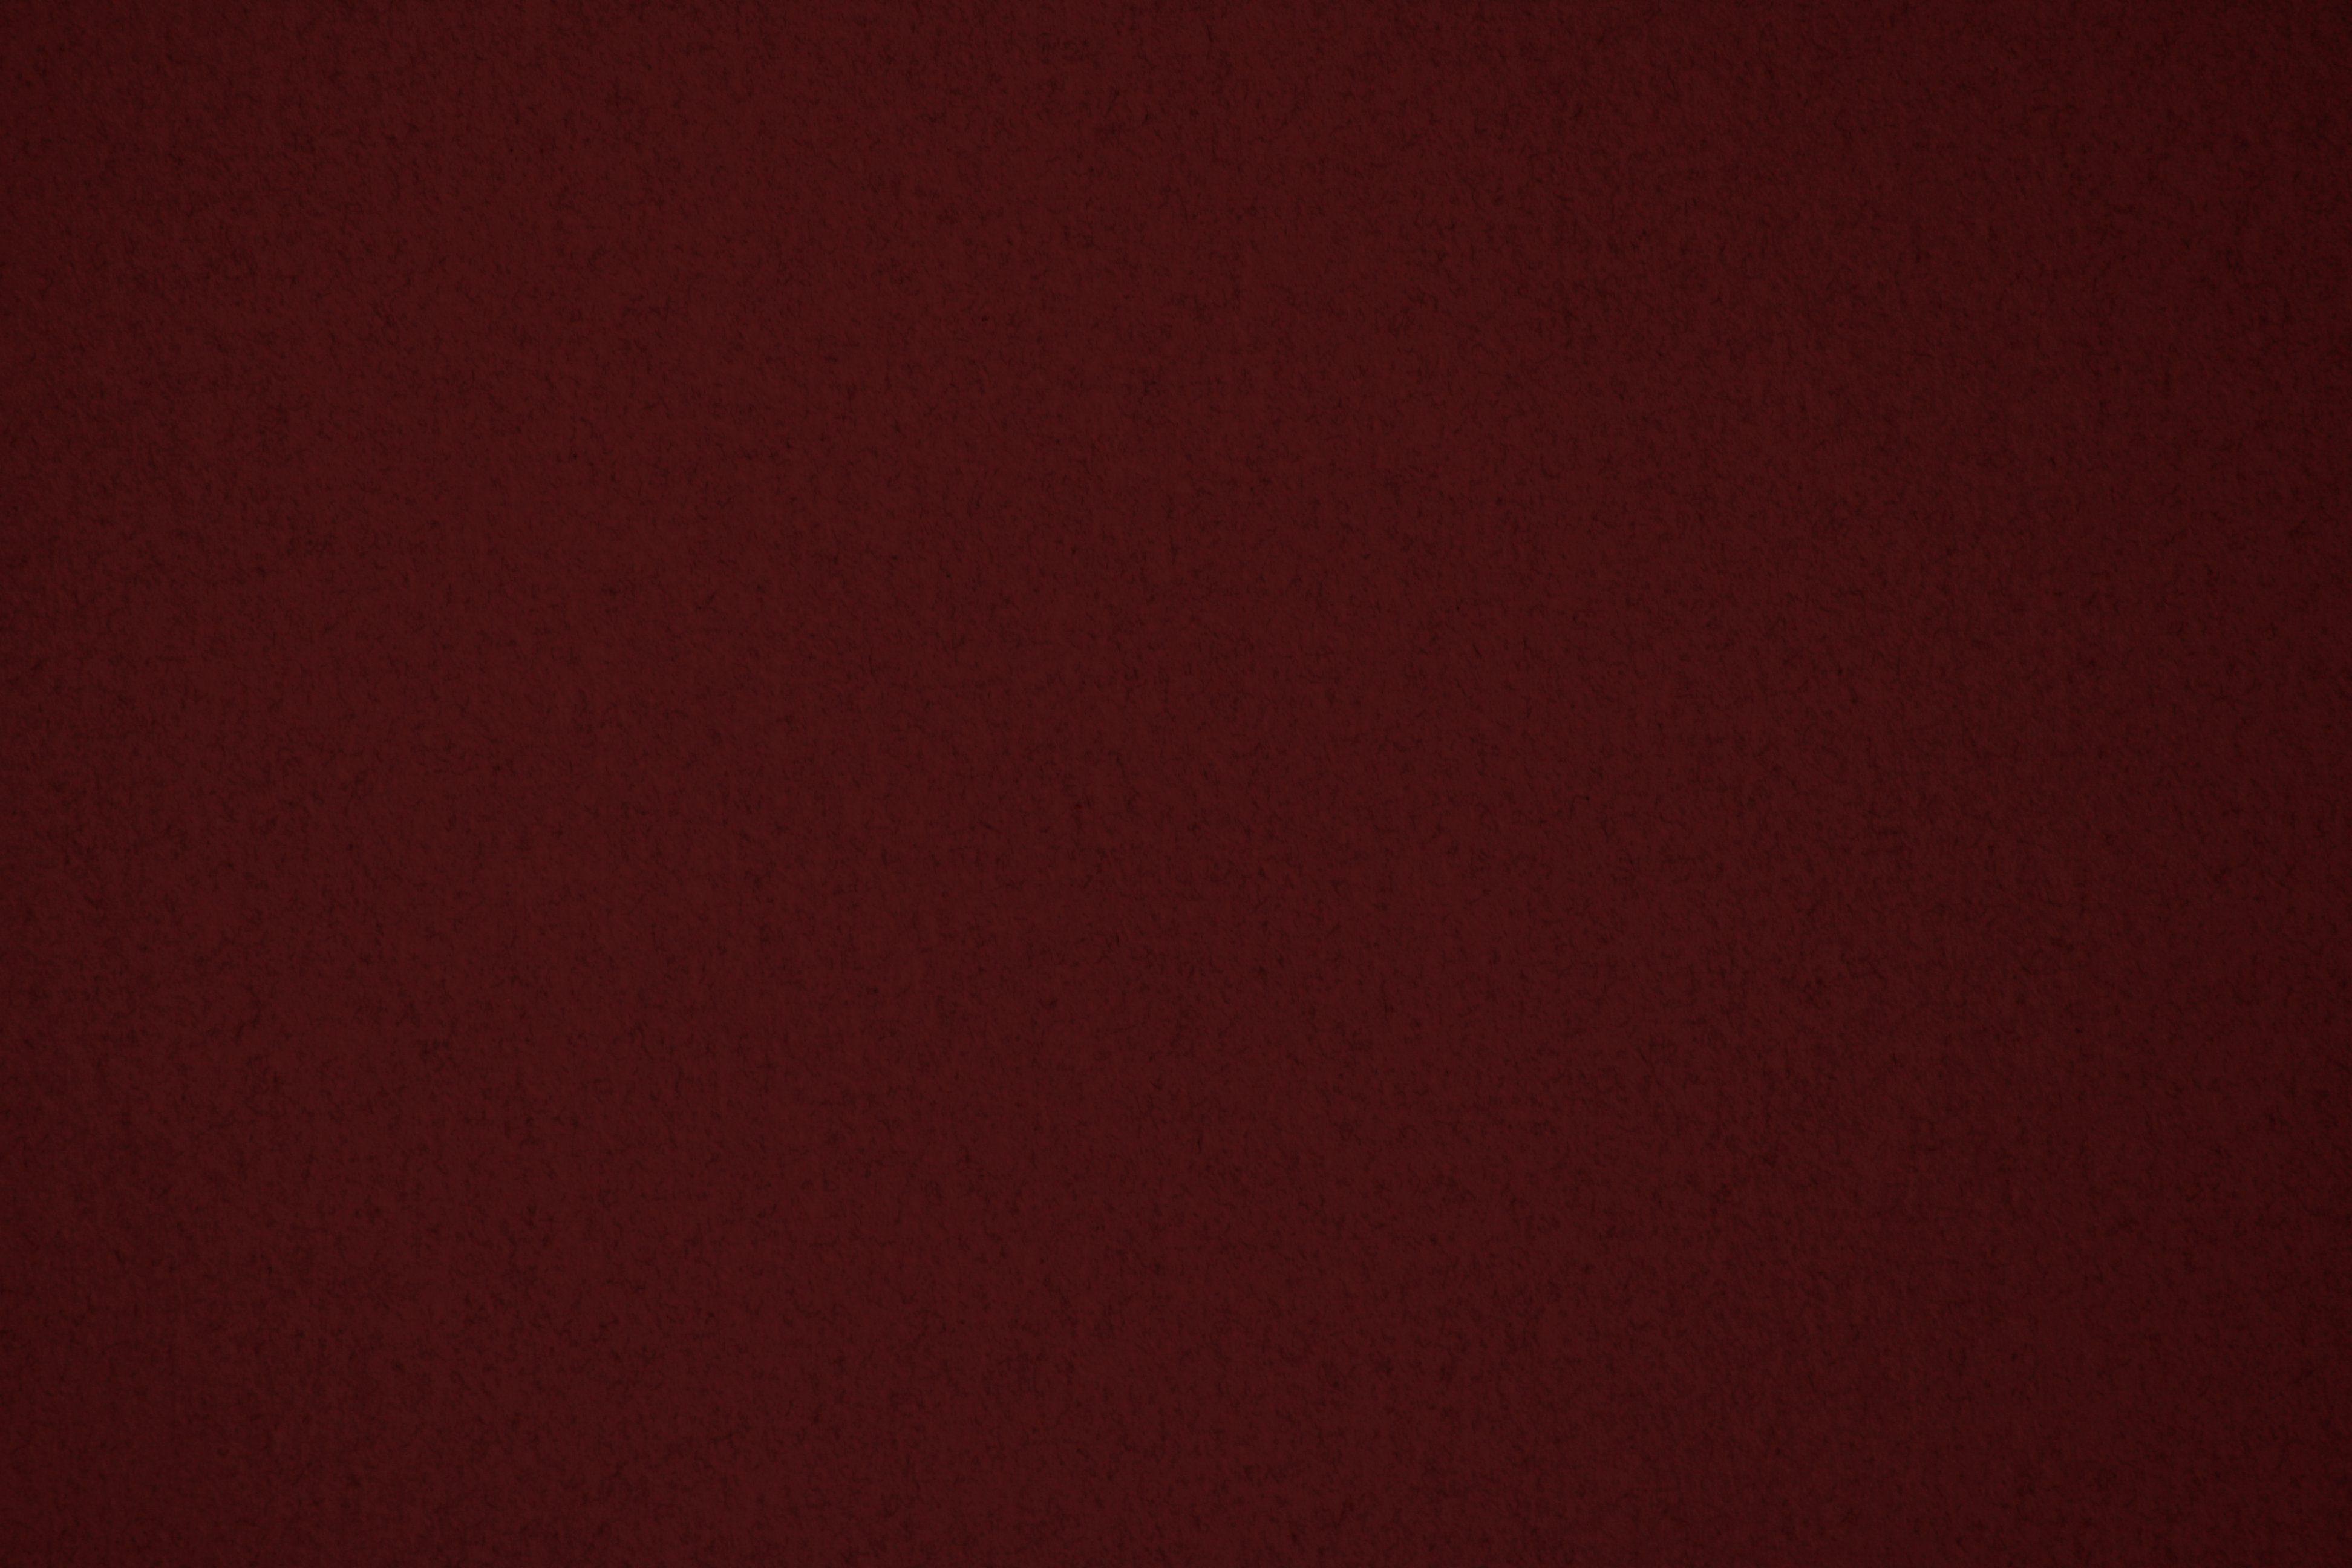 Maroon Colour Art Backgrounds